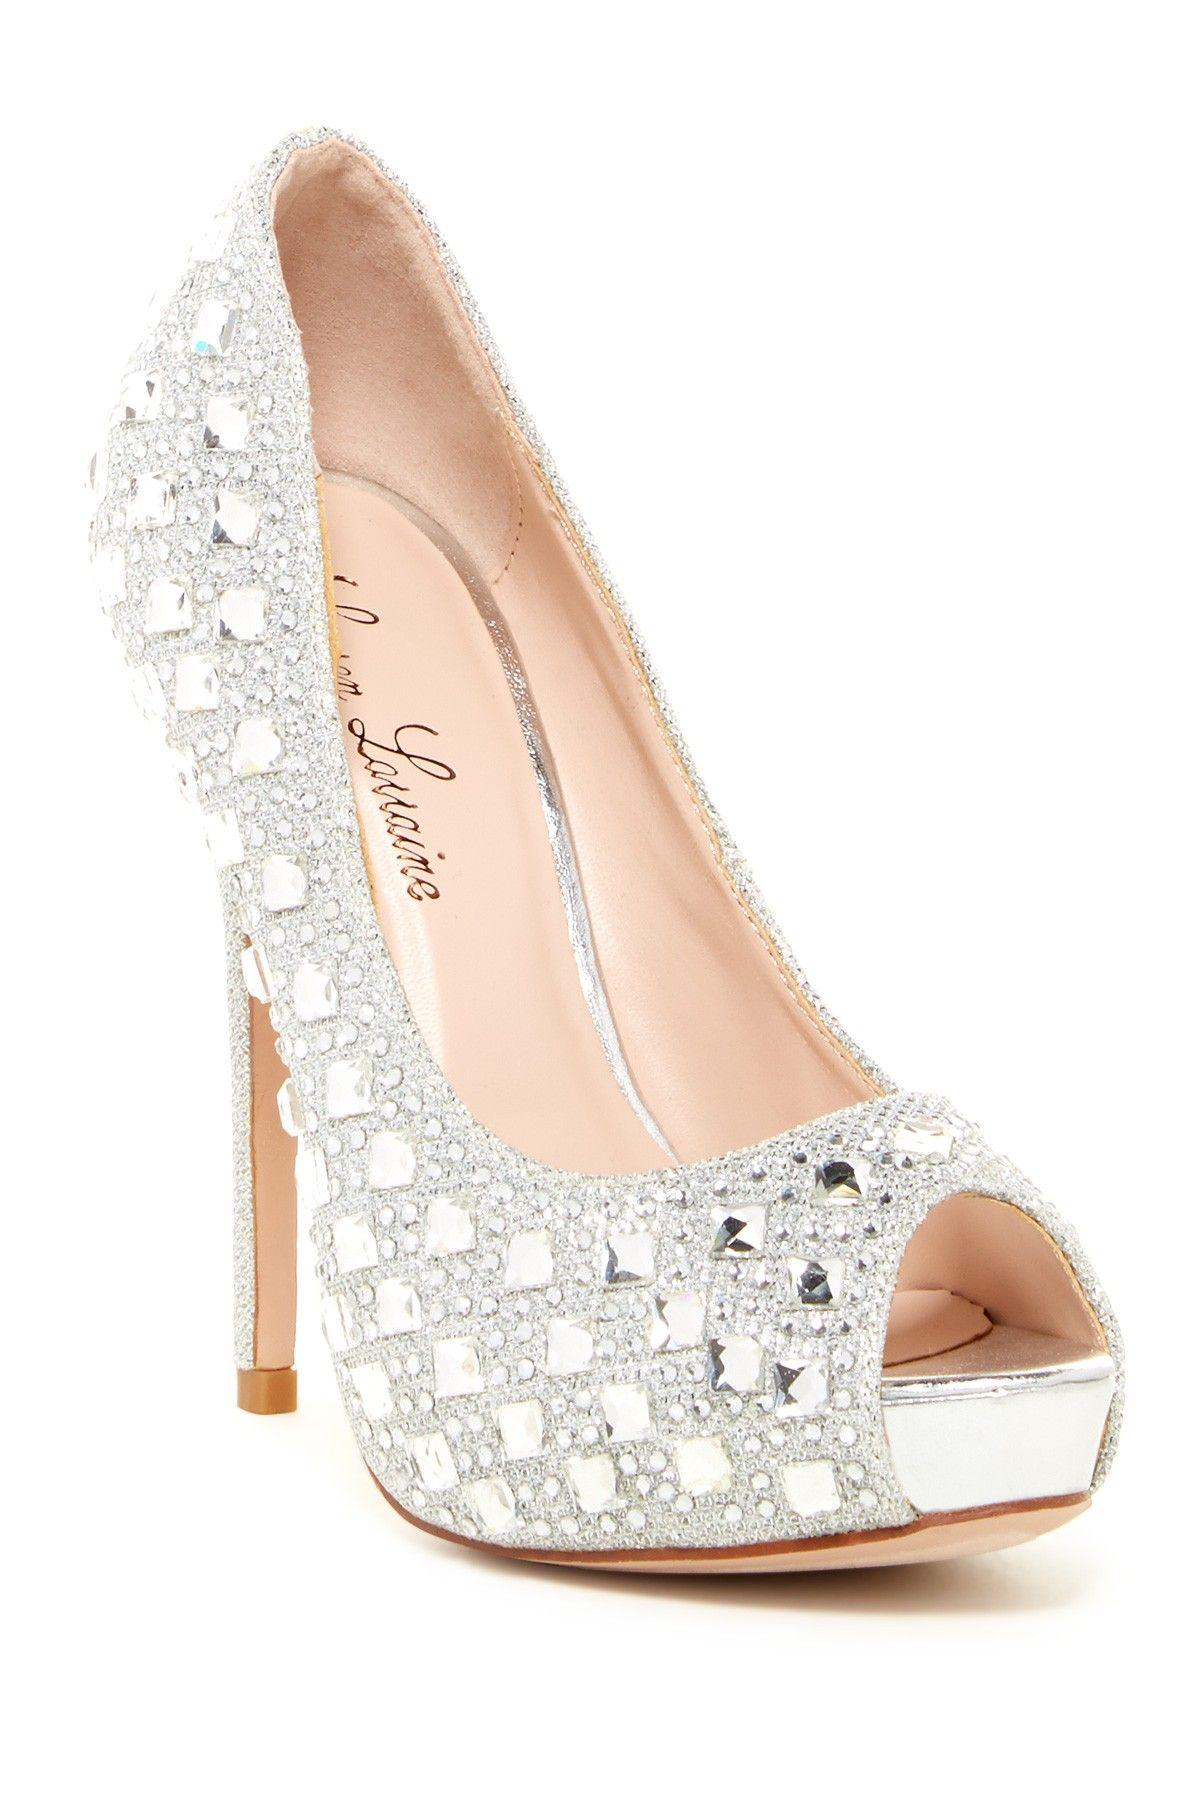 LAUREN LORRAINE Candy White Peep Toe Platform Rinestone Bridal Slingback Pump